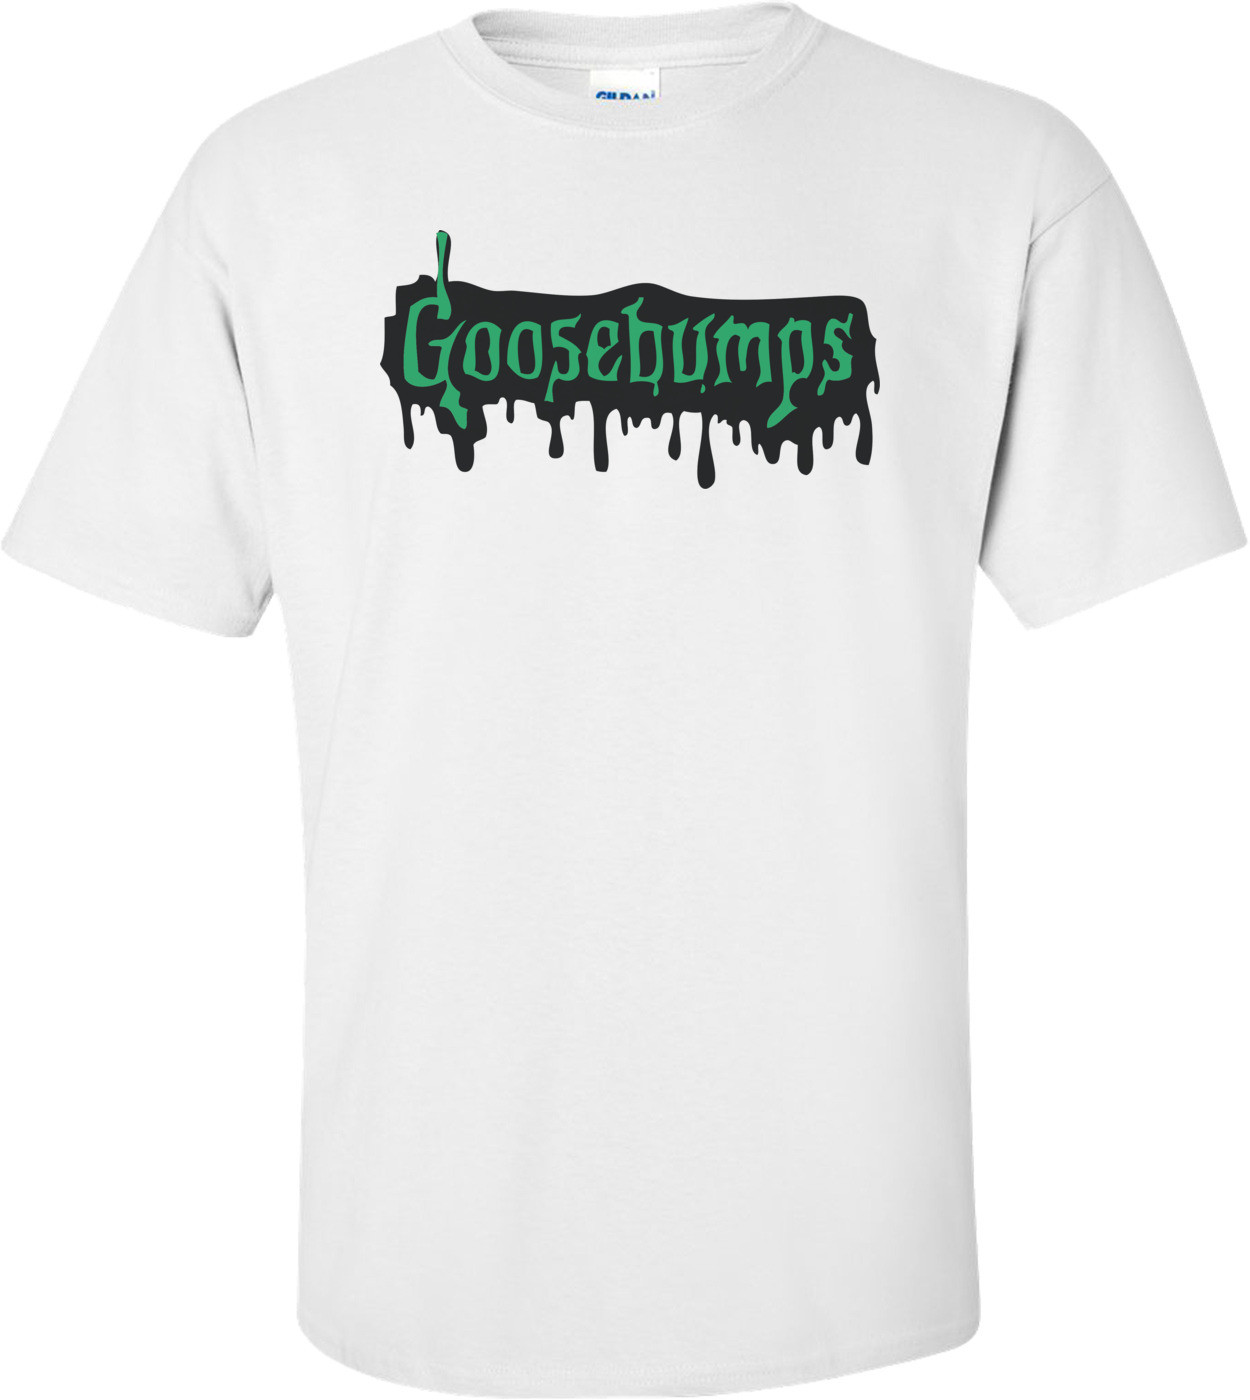 Goosebumps T-shirt